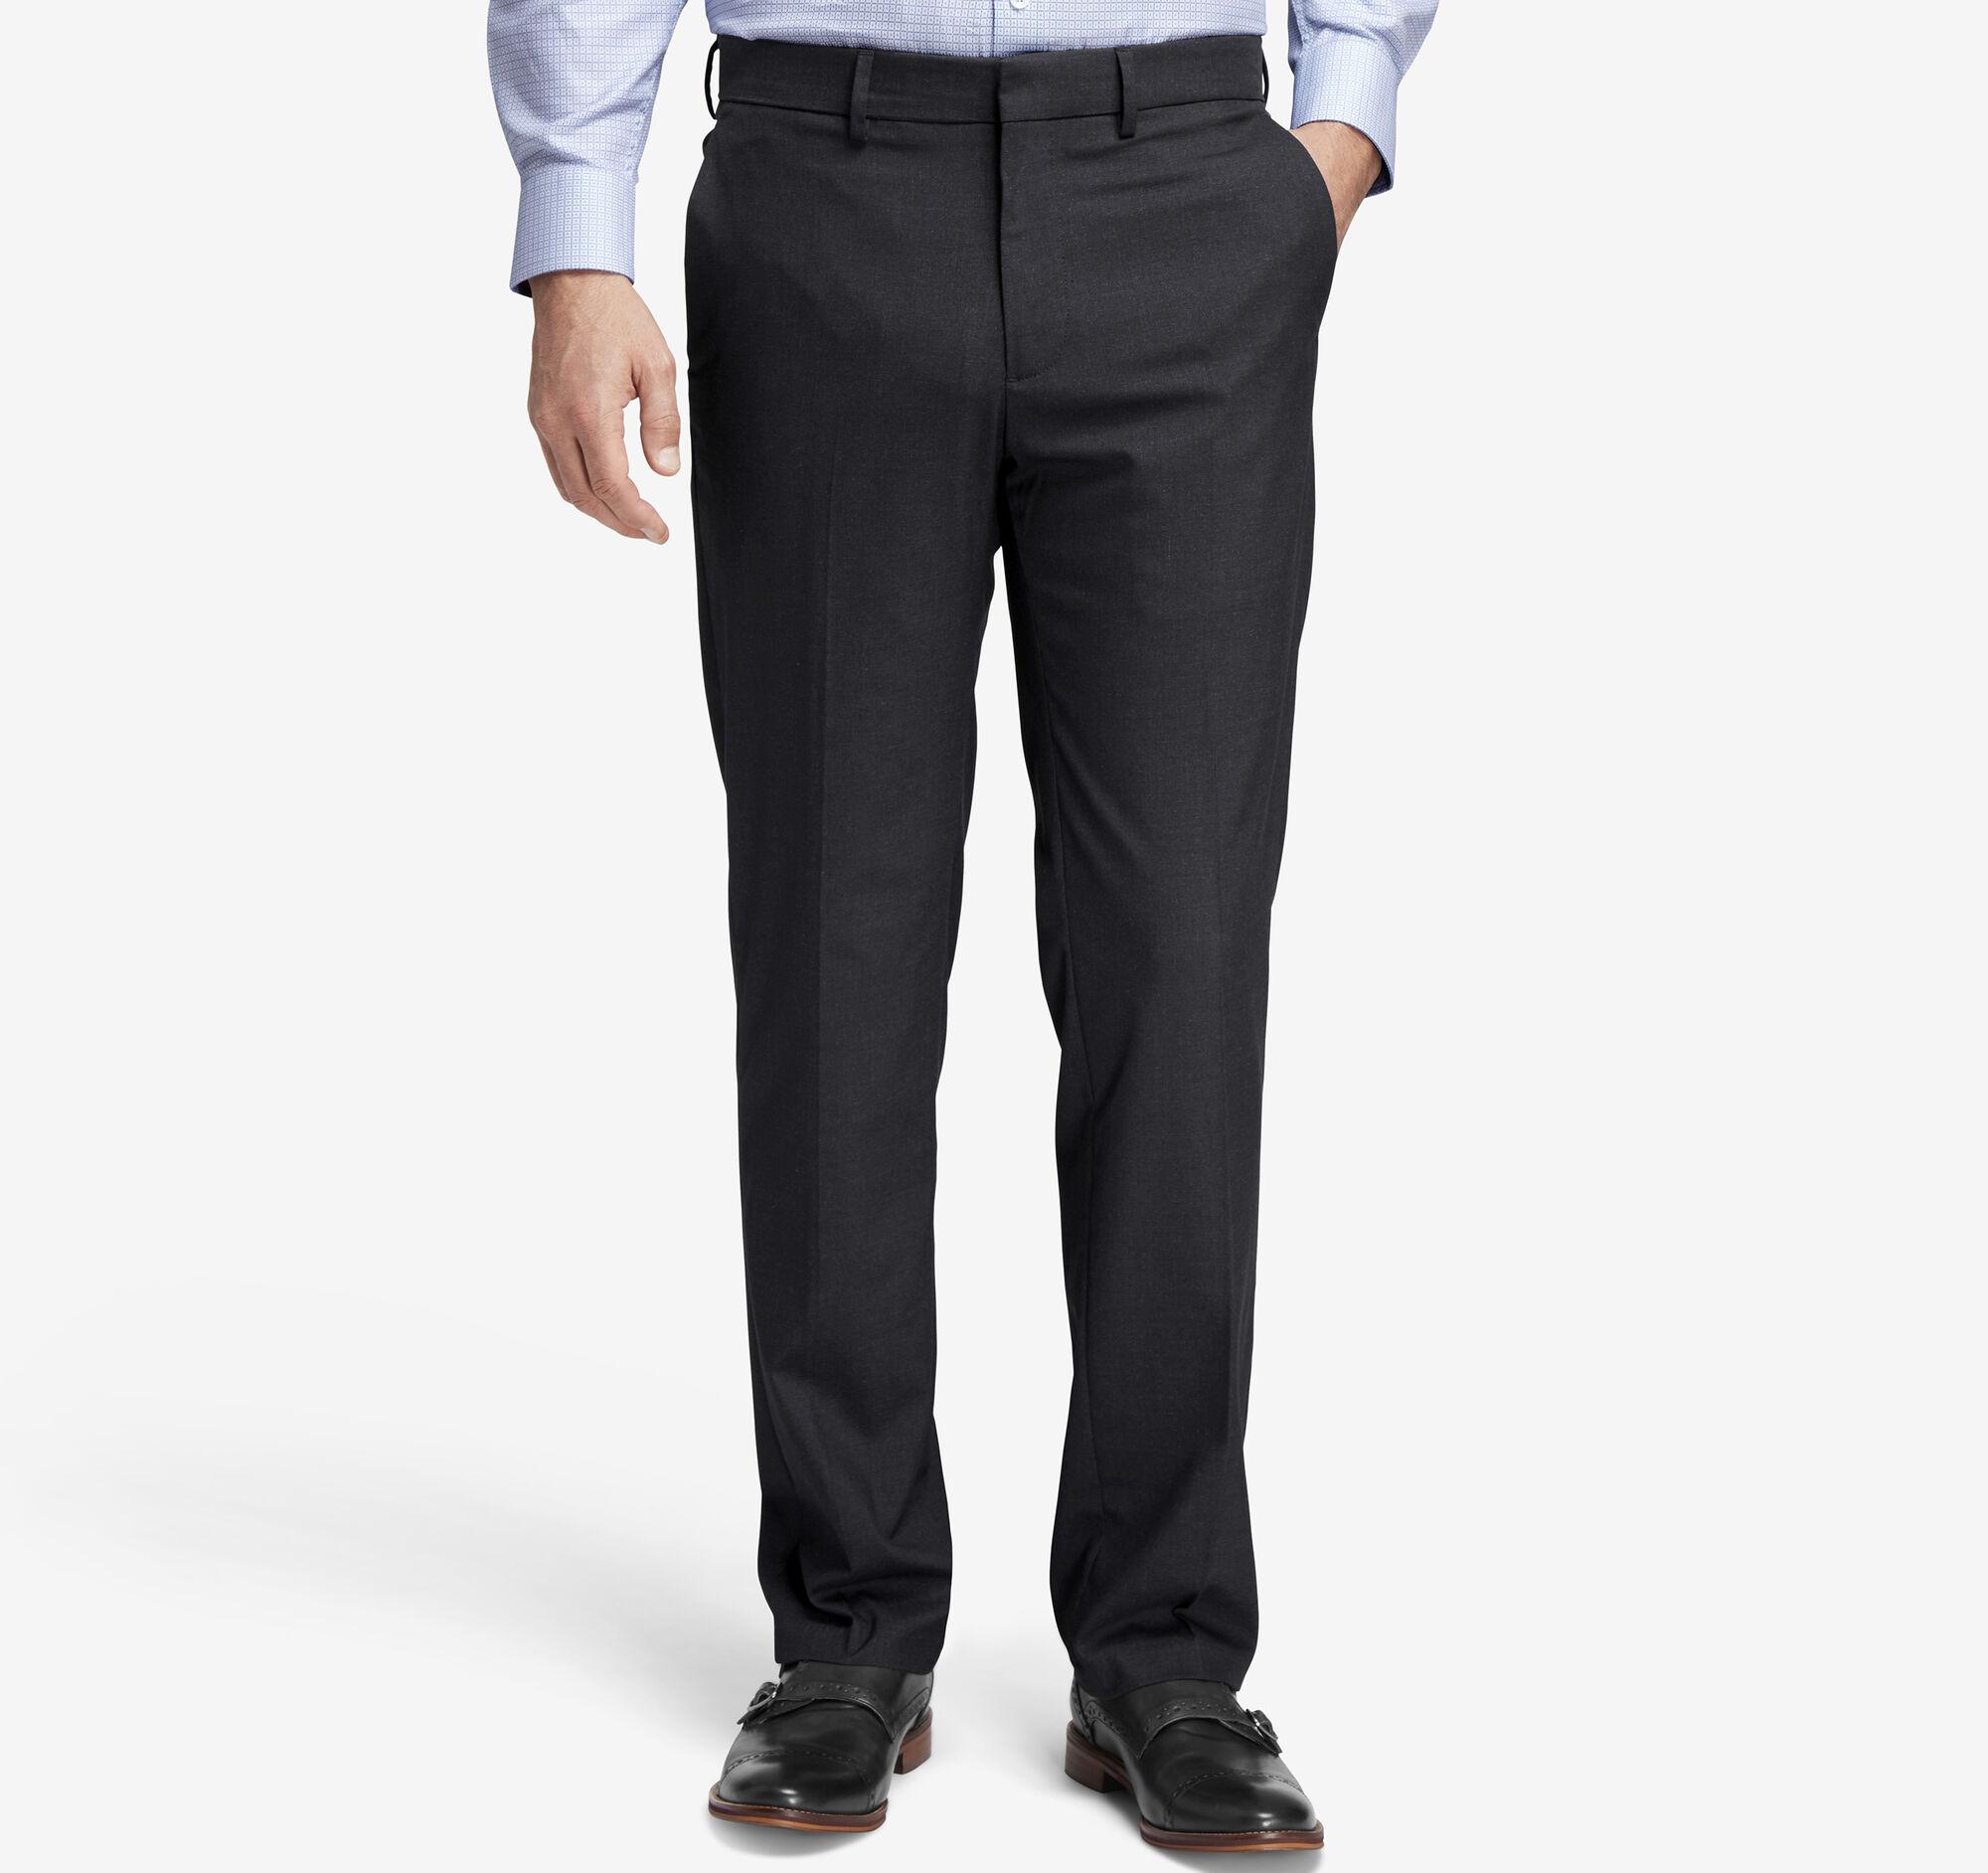 c826dd7c0d Slim Leg Dress Slacks - raveitsafe